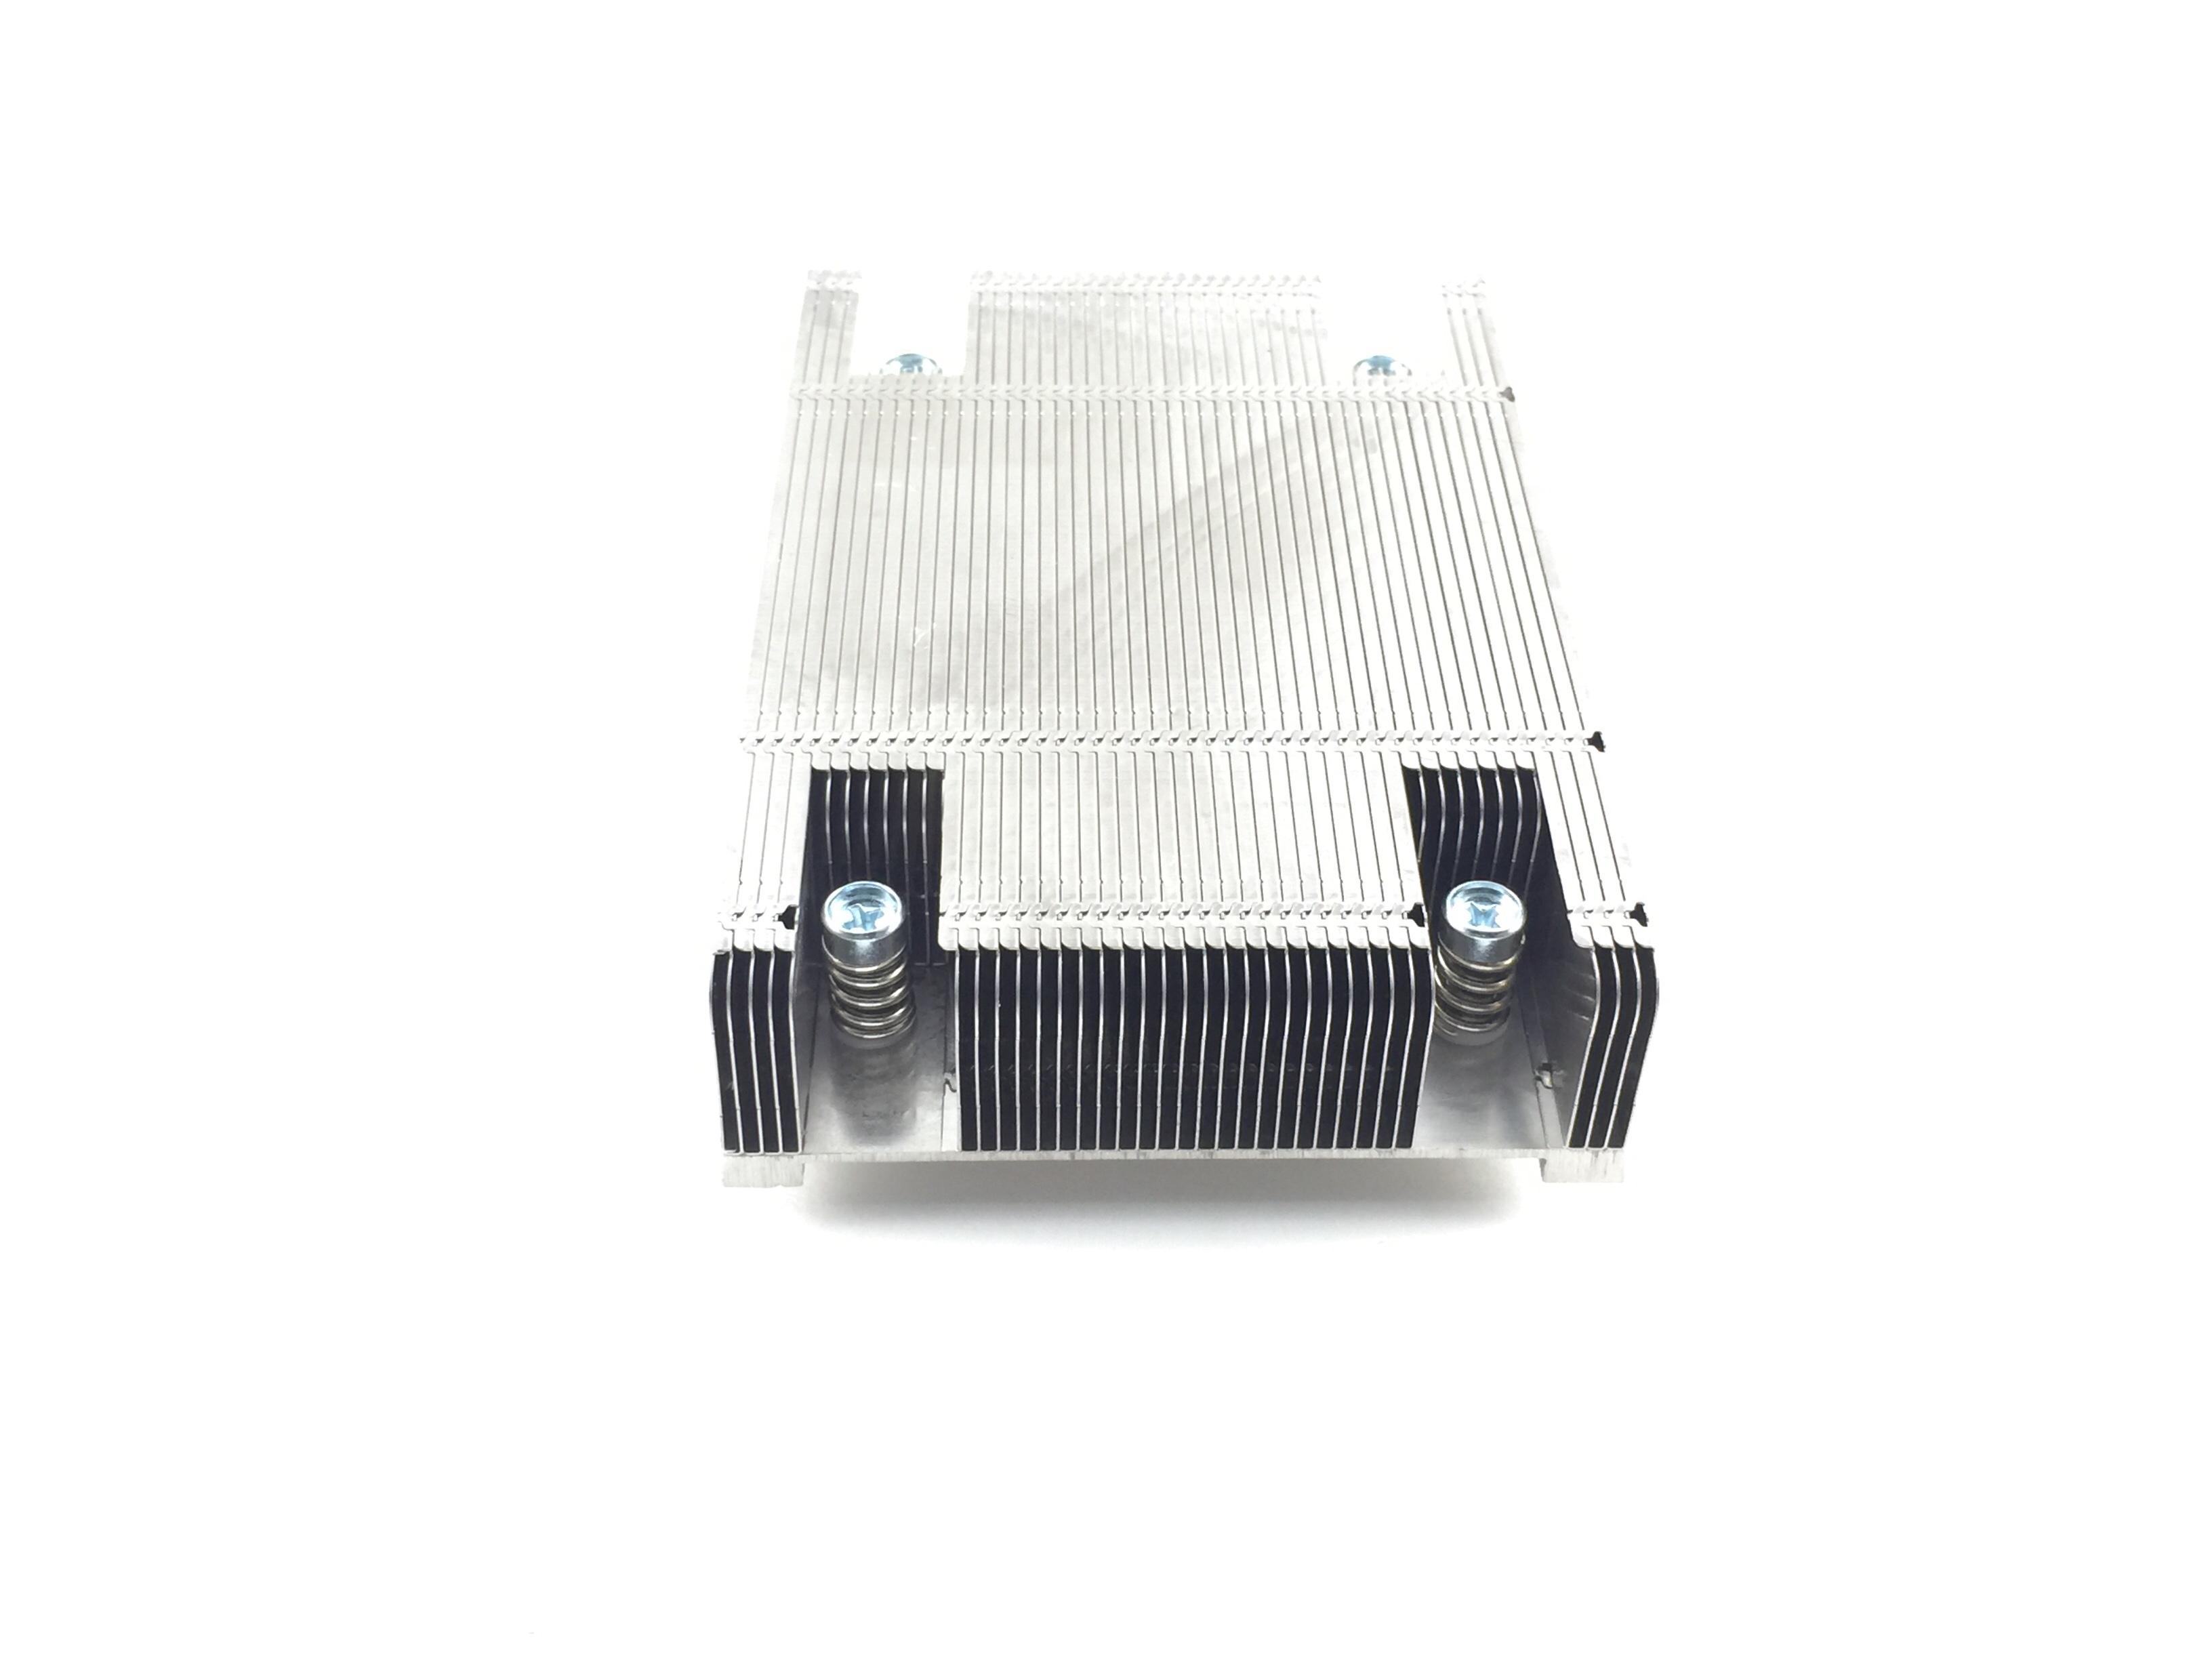 Dell PowerEdge R630 Heatsink (Y8MC1)